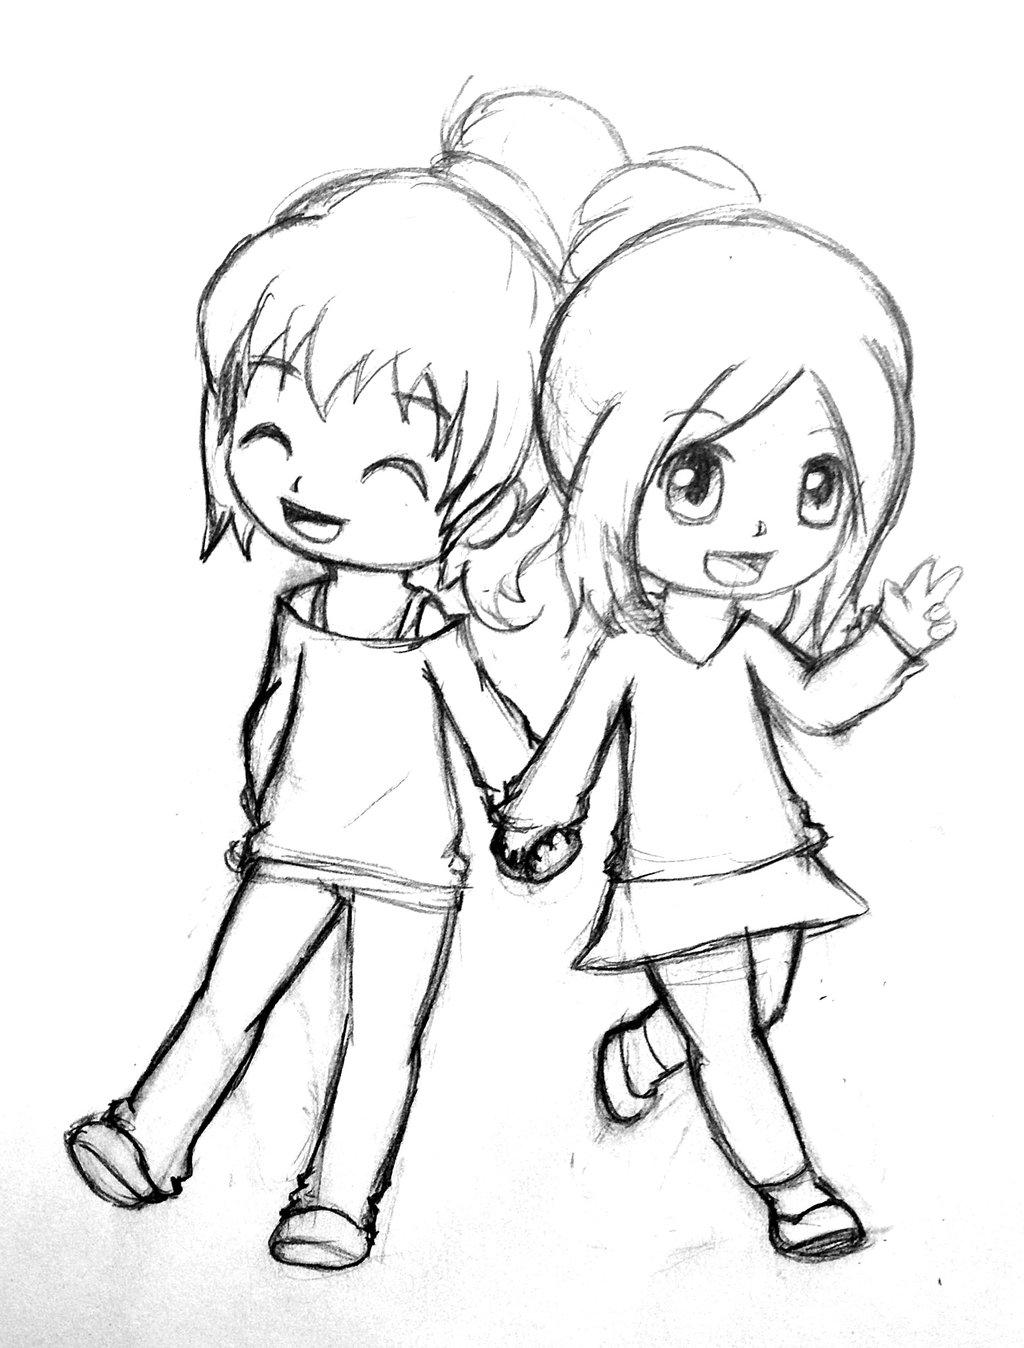 1024x1348 Adult Best Friend Drawings Best Friend Drawings Simple. Best